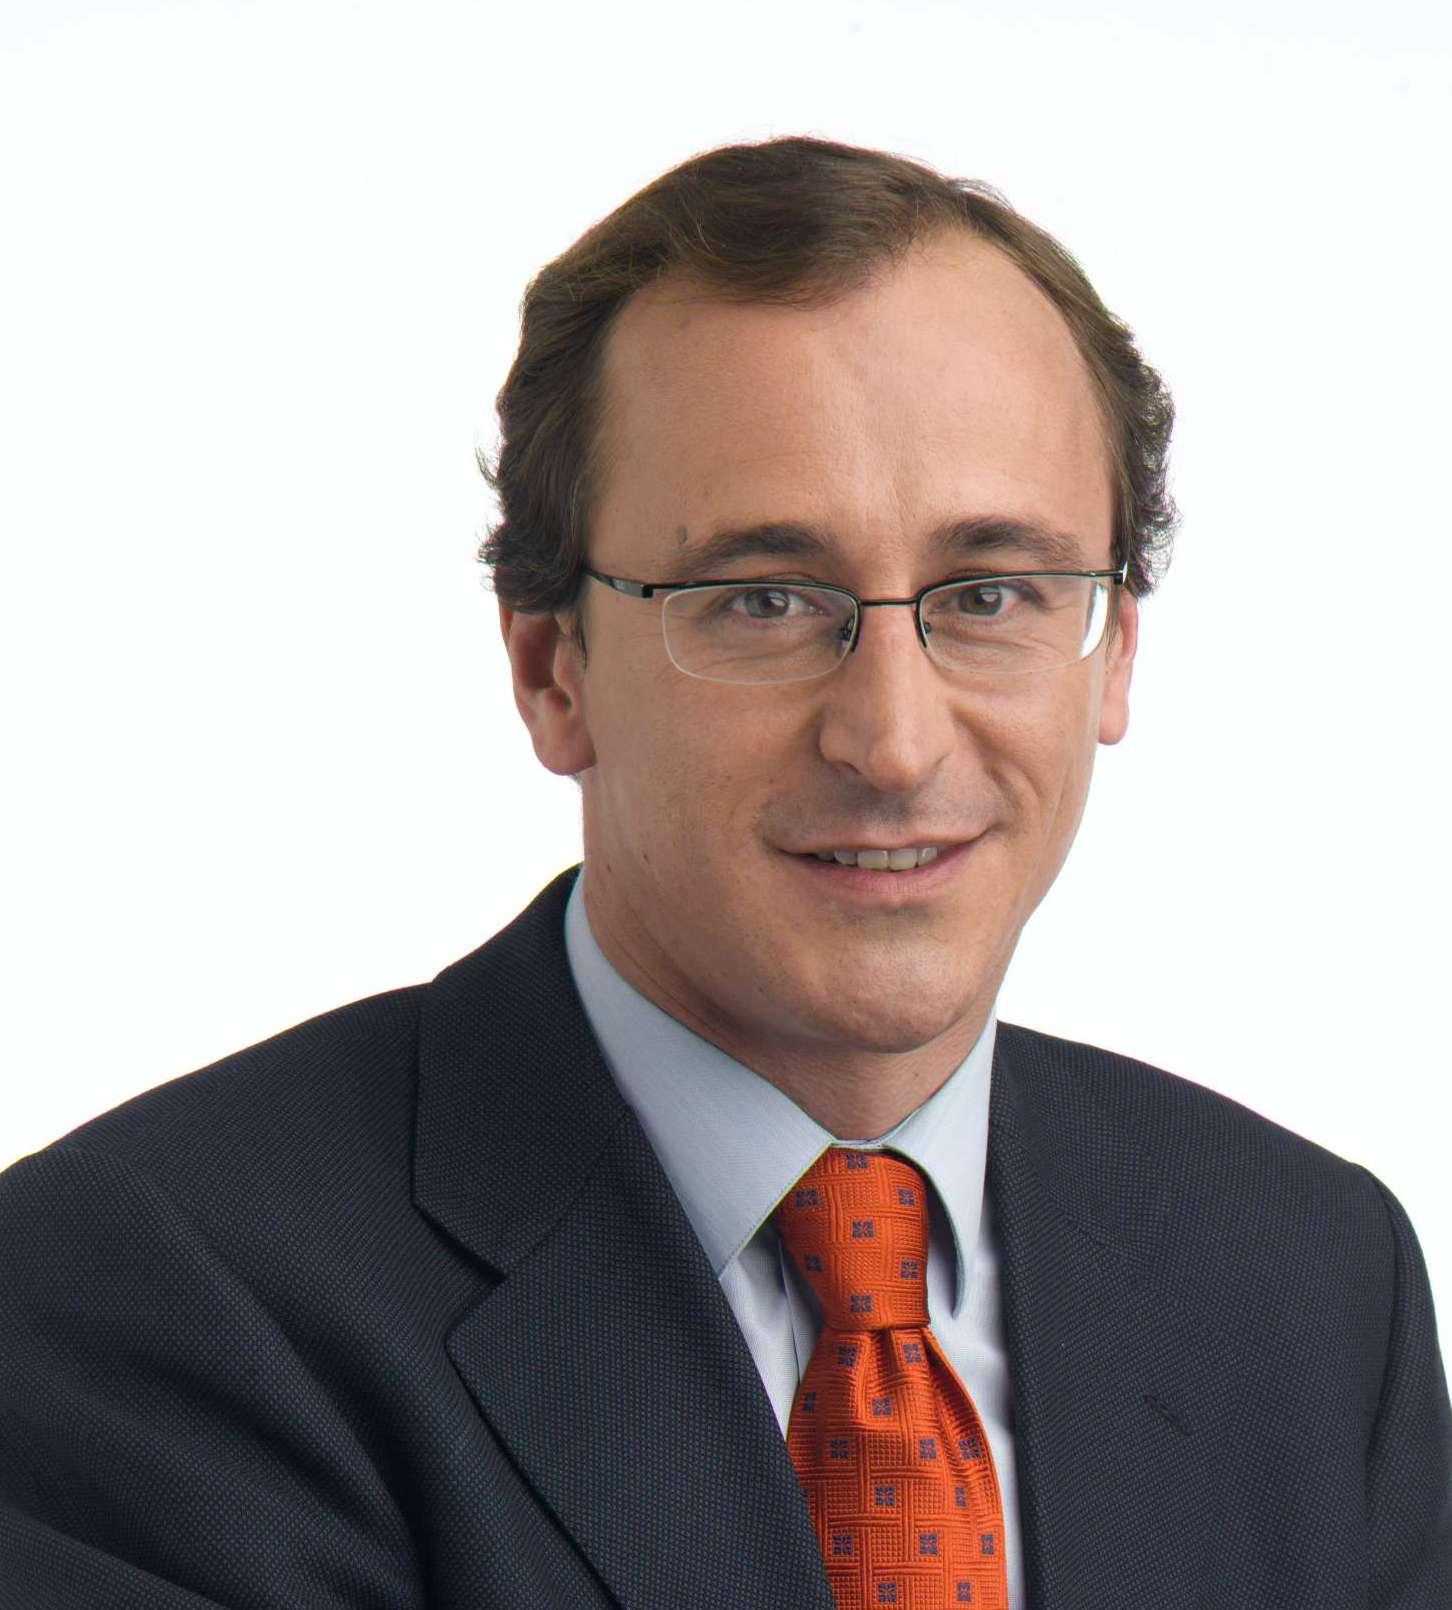 Juan Contreras